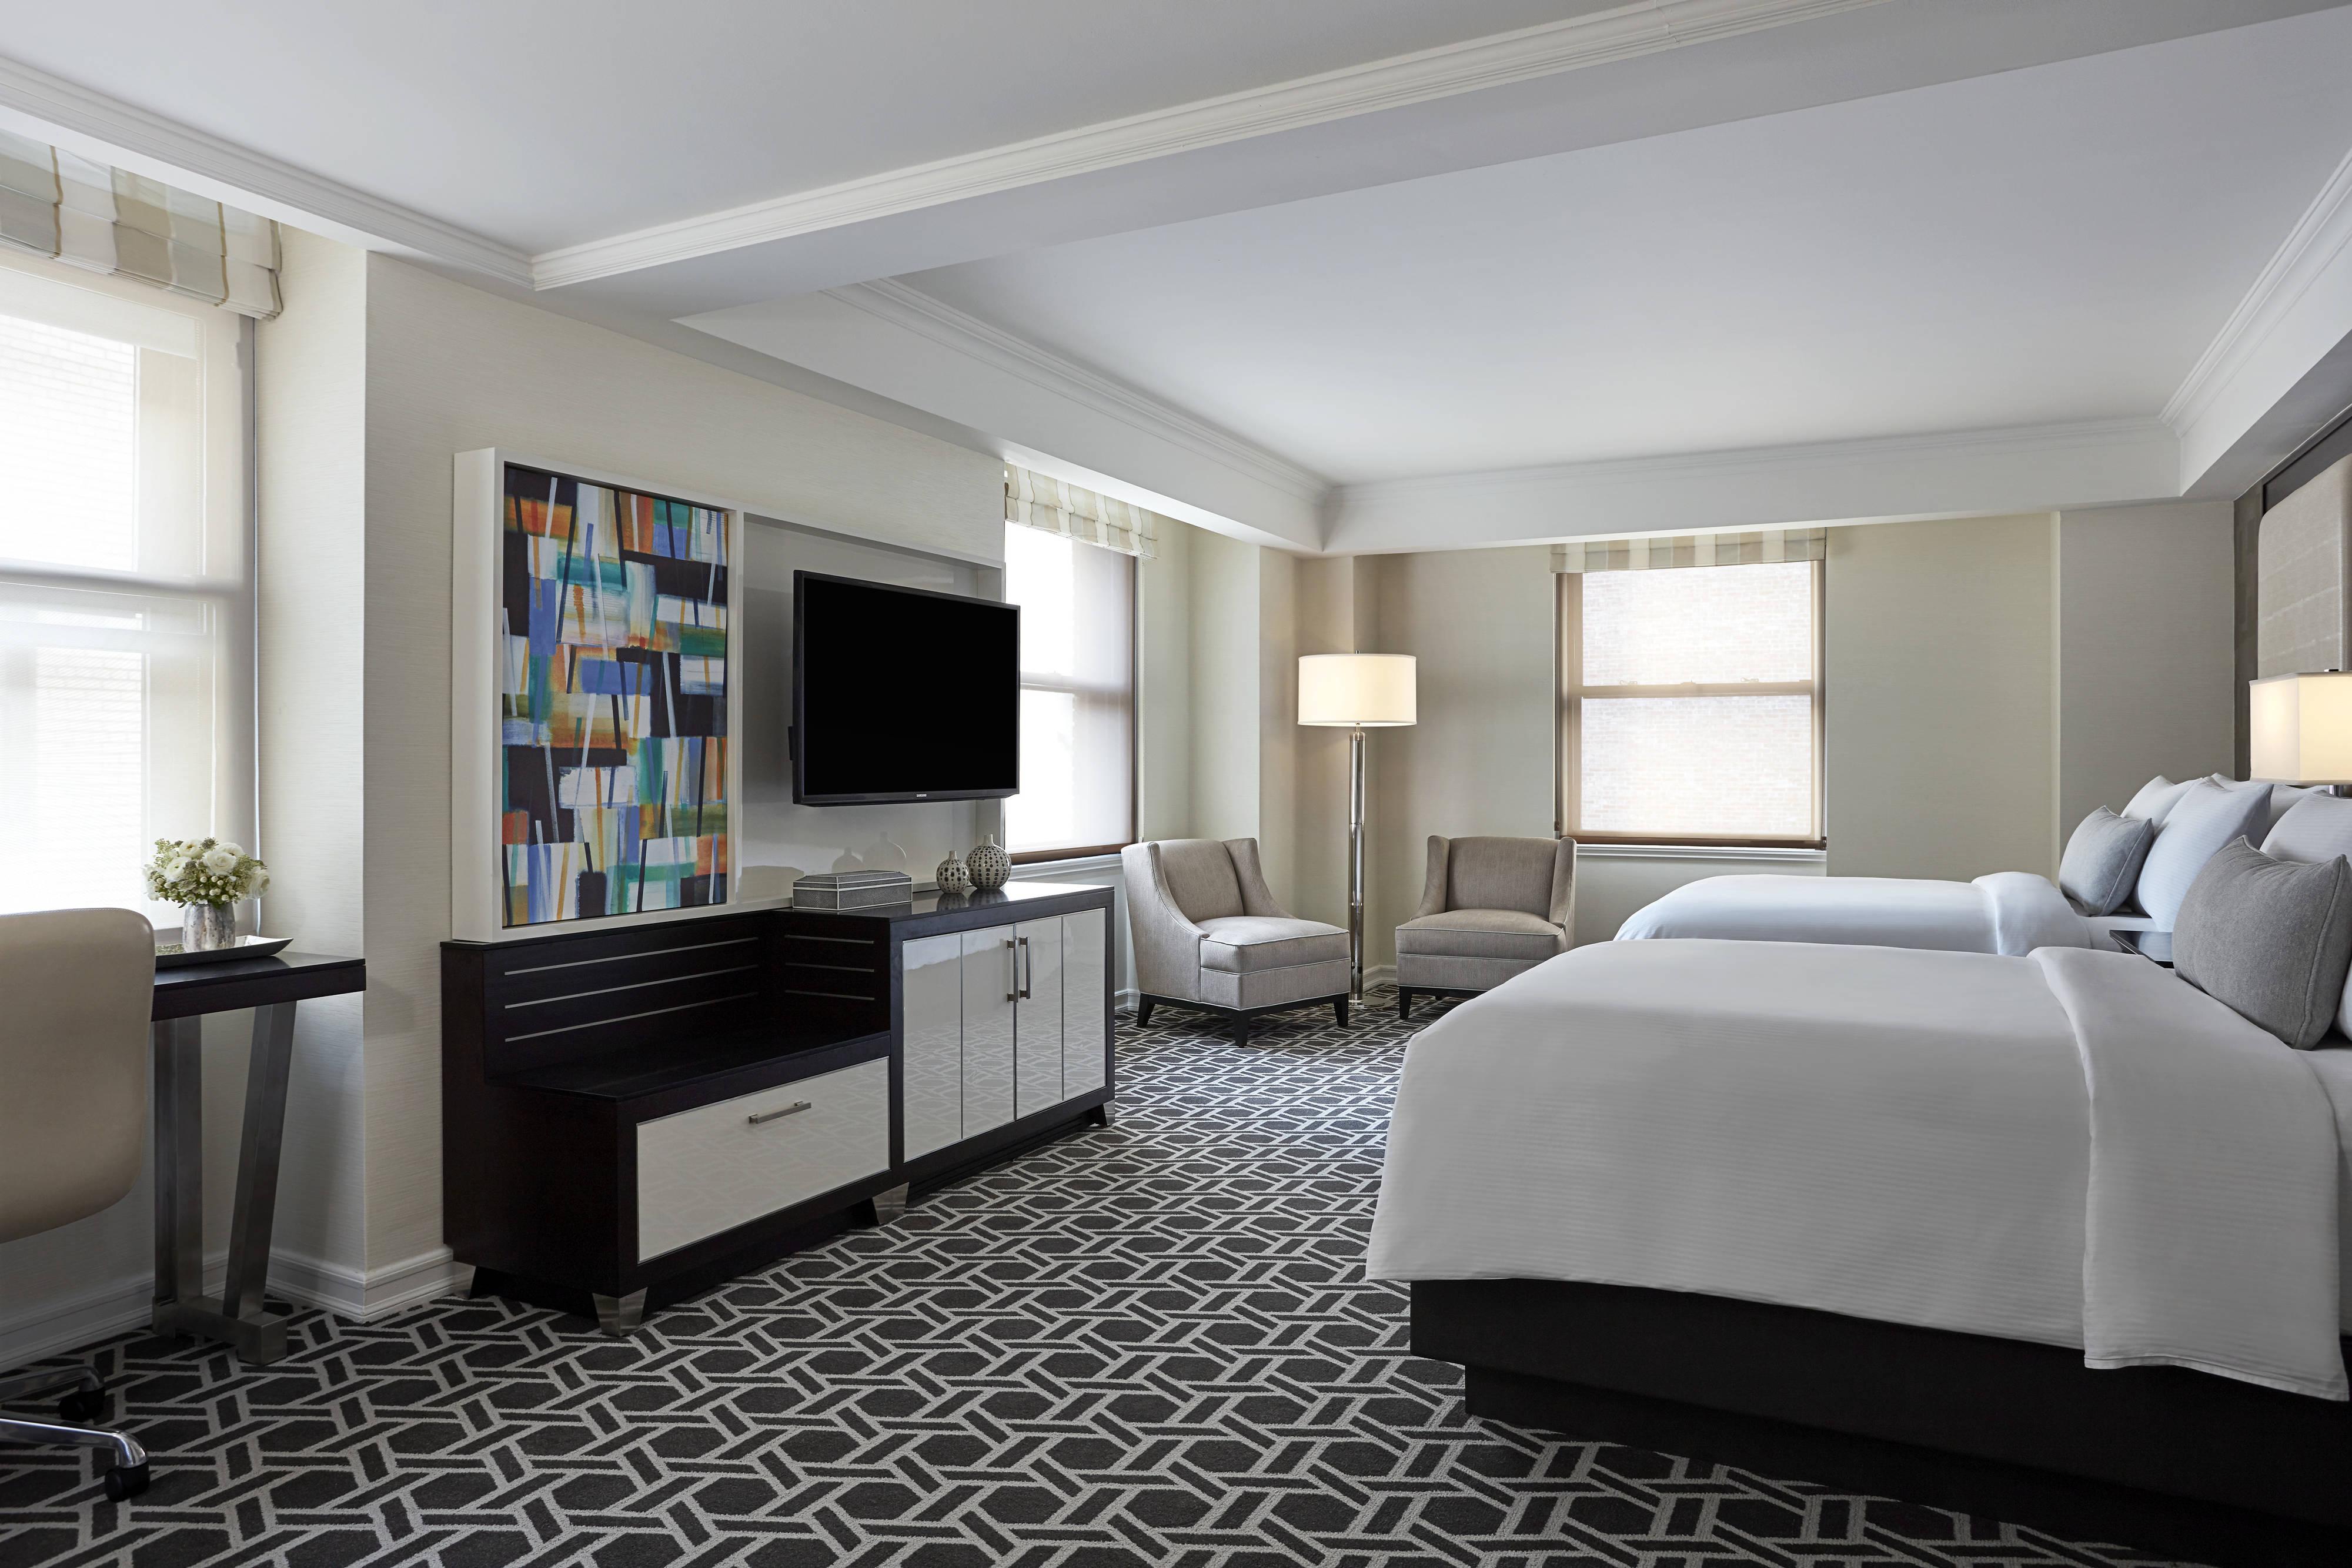 jw marriott essex house new york hotel room